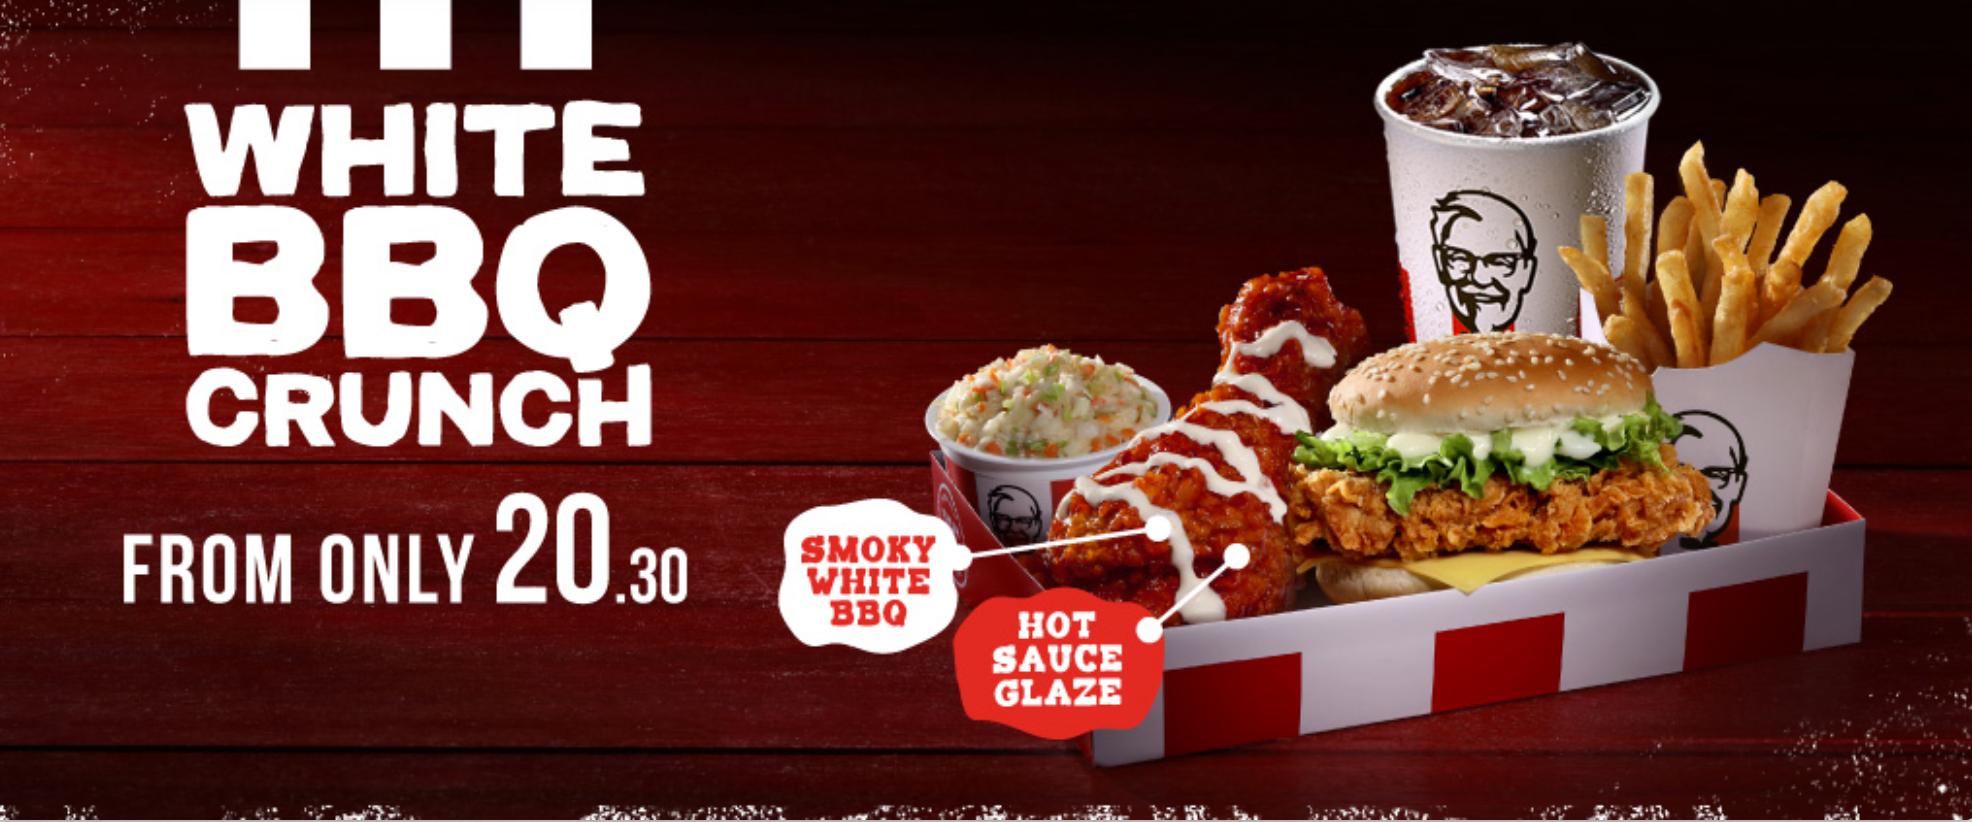 KFC White BBQ Crunch